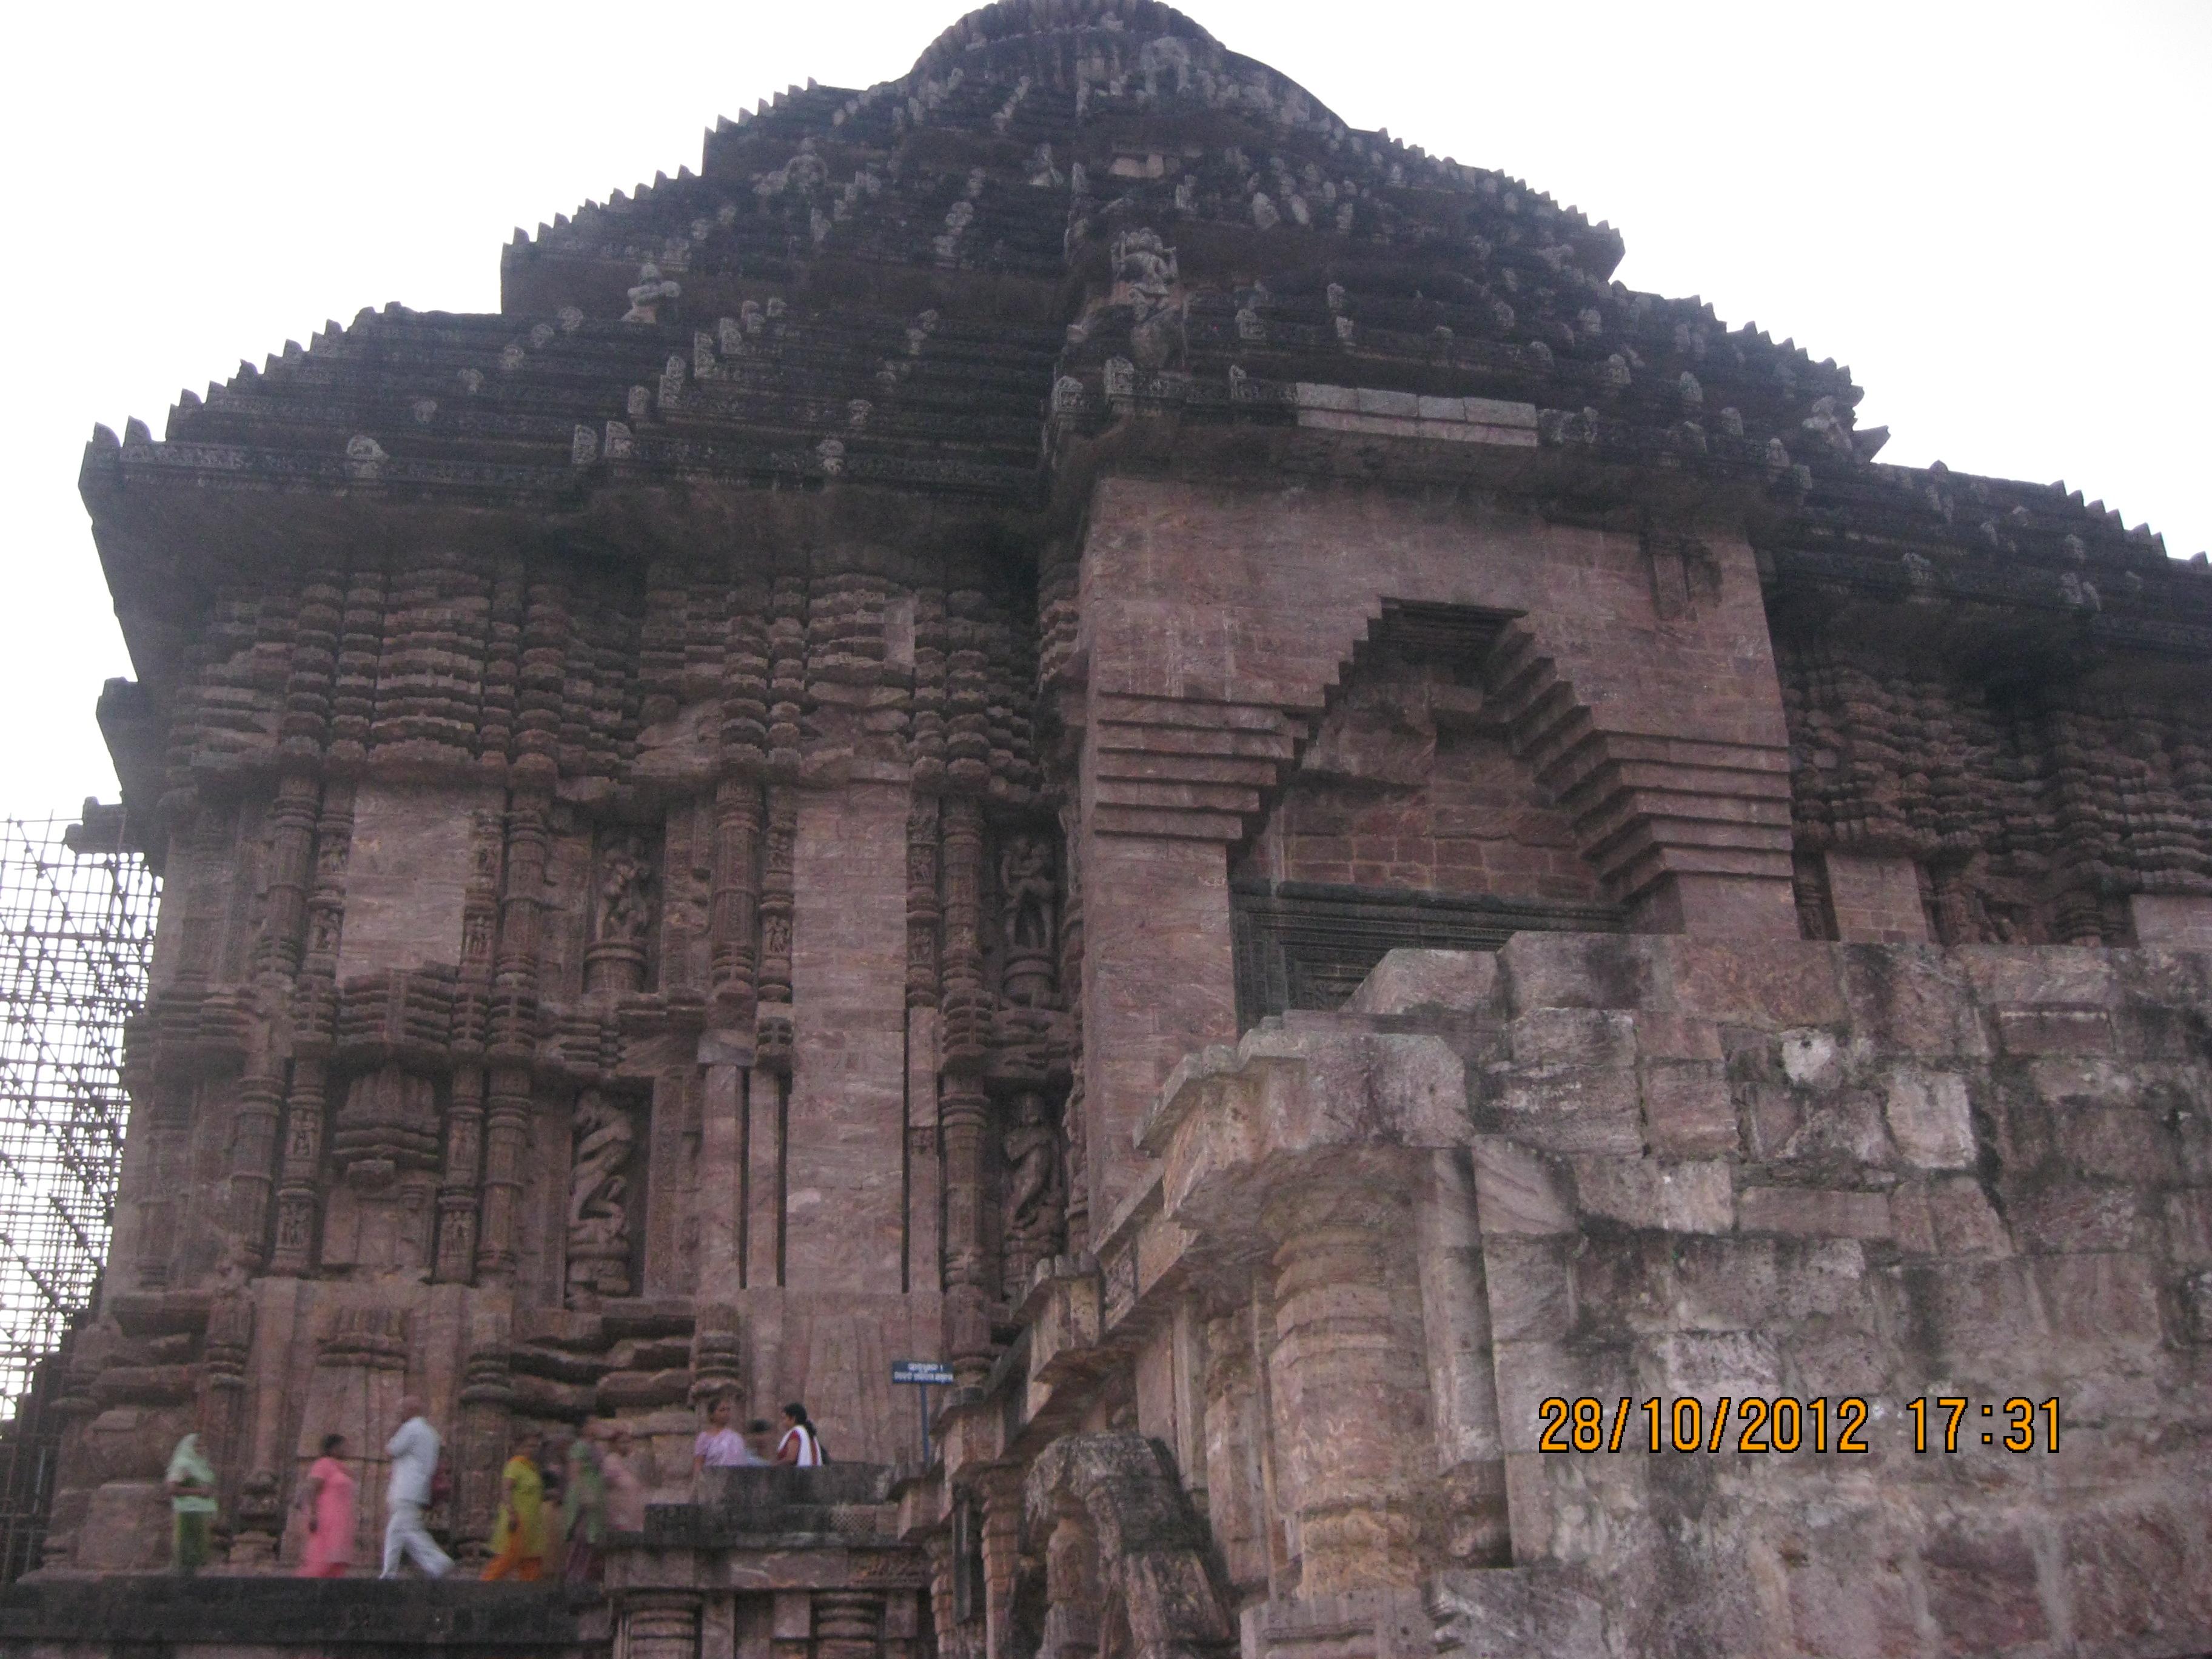 essay about konark temple Gomateshwara, harmandir sahib (golden temple), taj mahal, hampi, konark  sun temple, nalanda and khajuraho all of these seven wonders are located in .